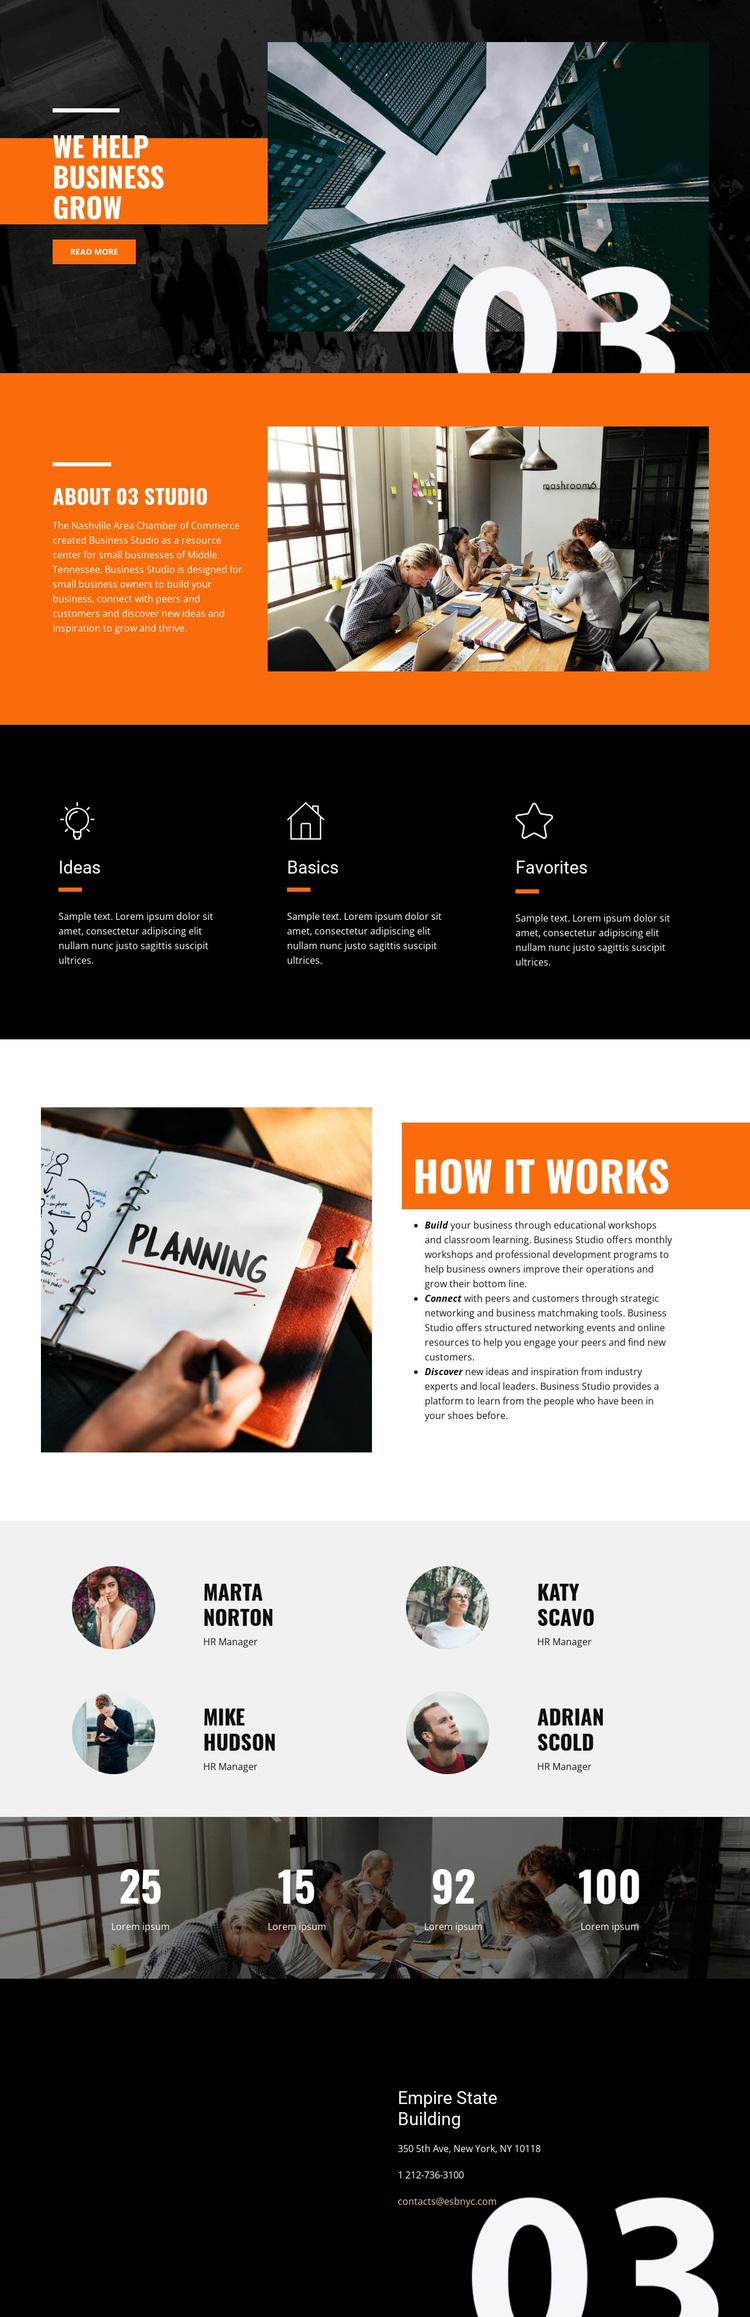 Business Grow Website Design